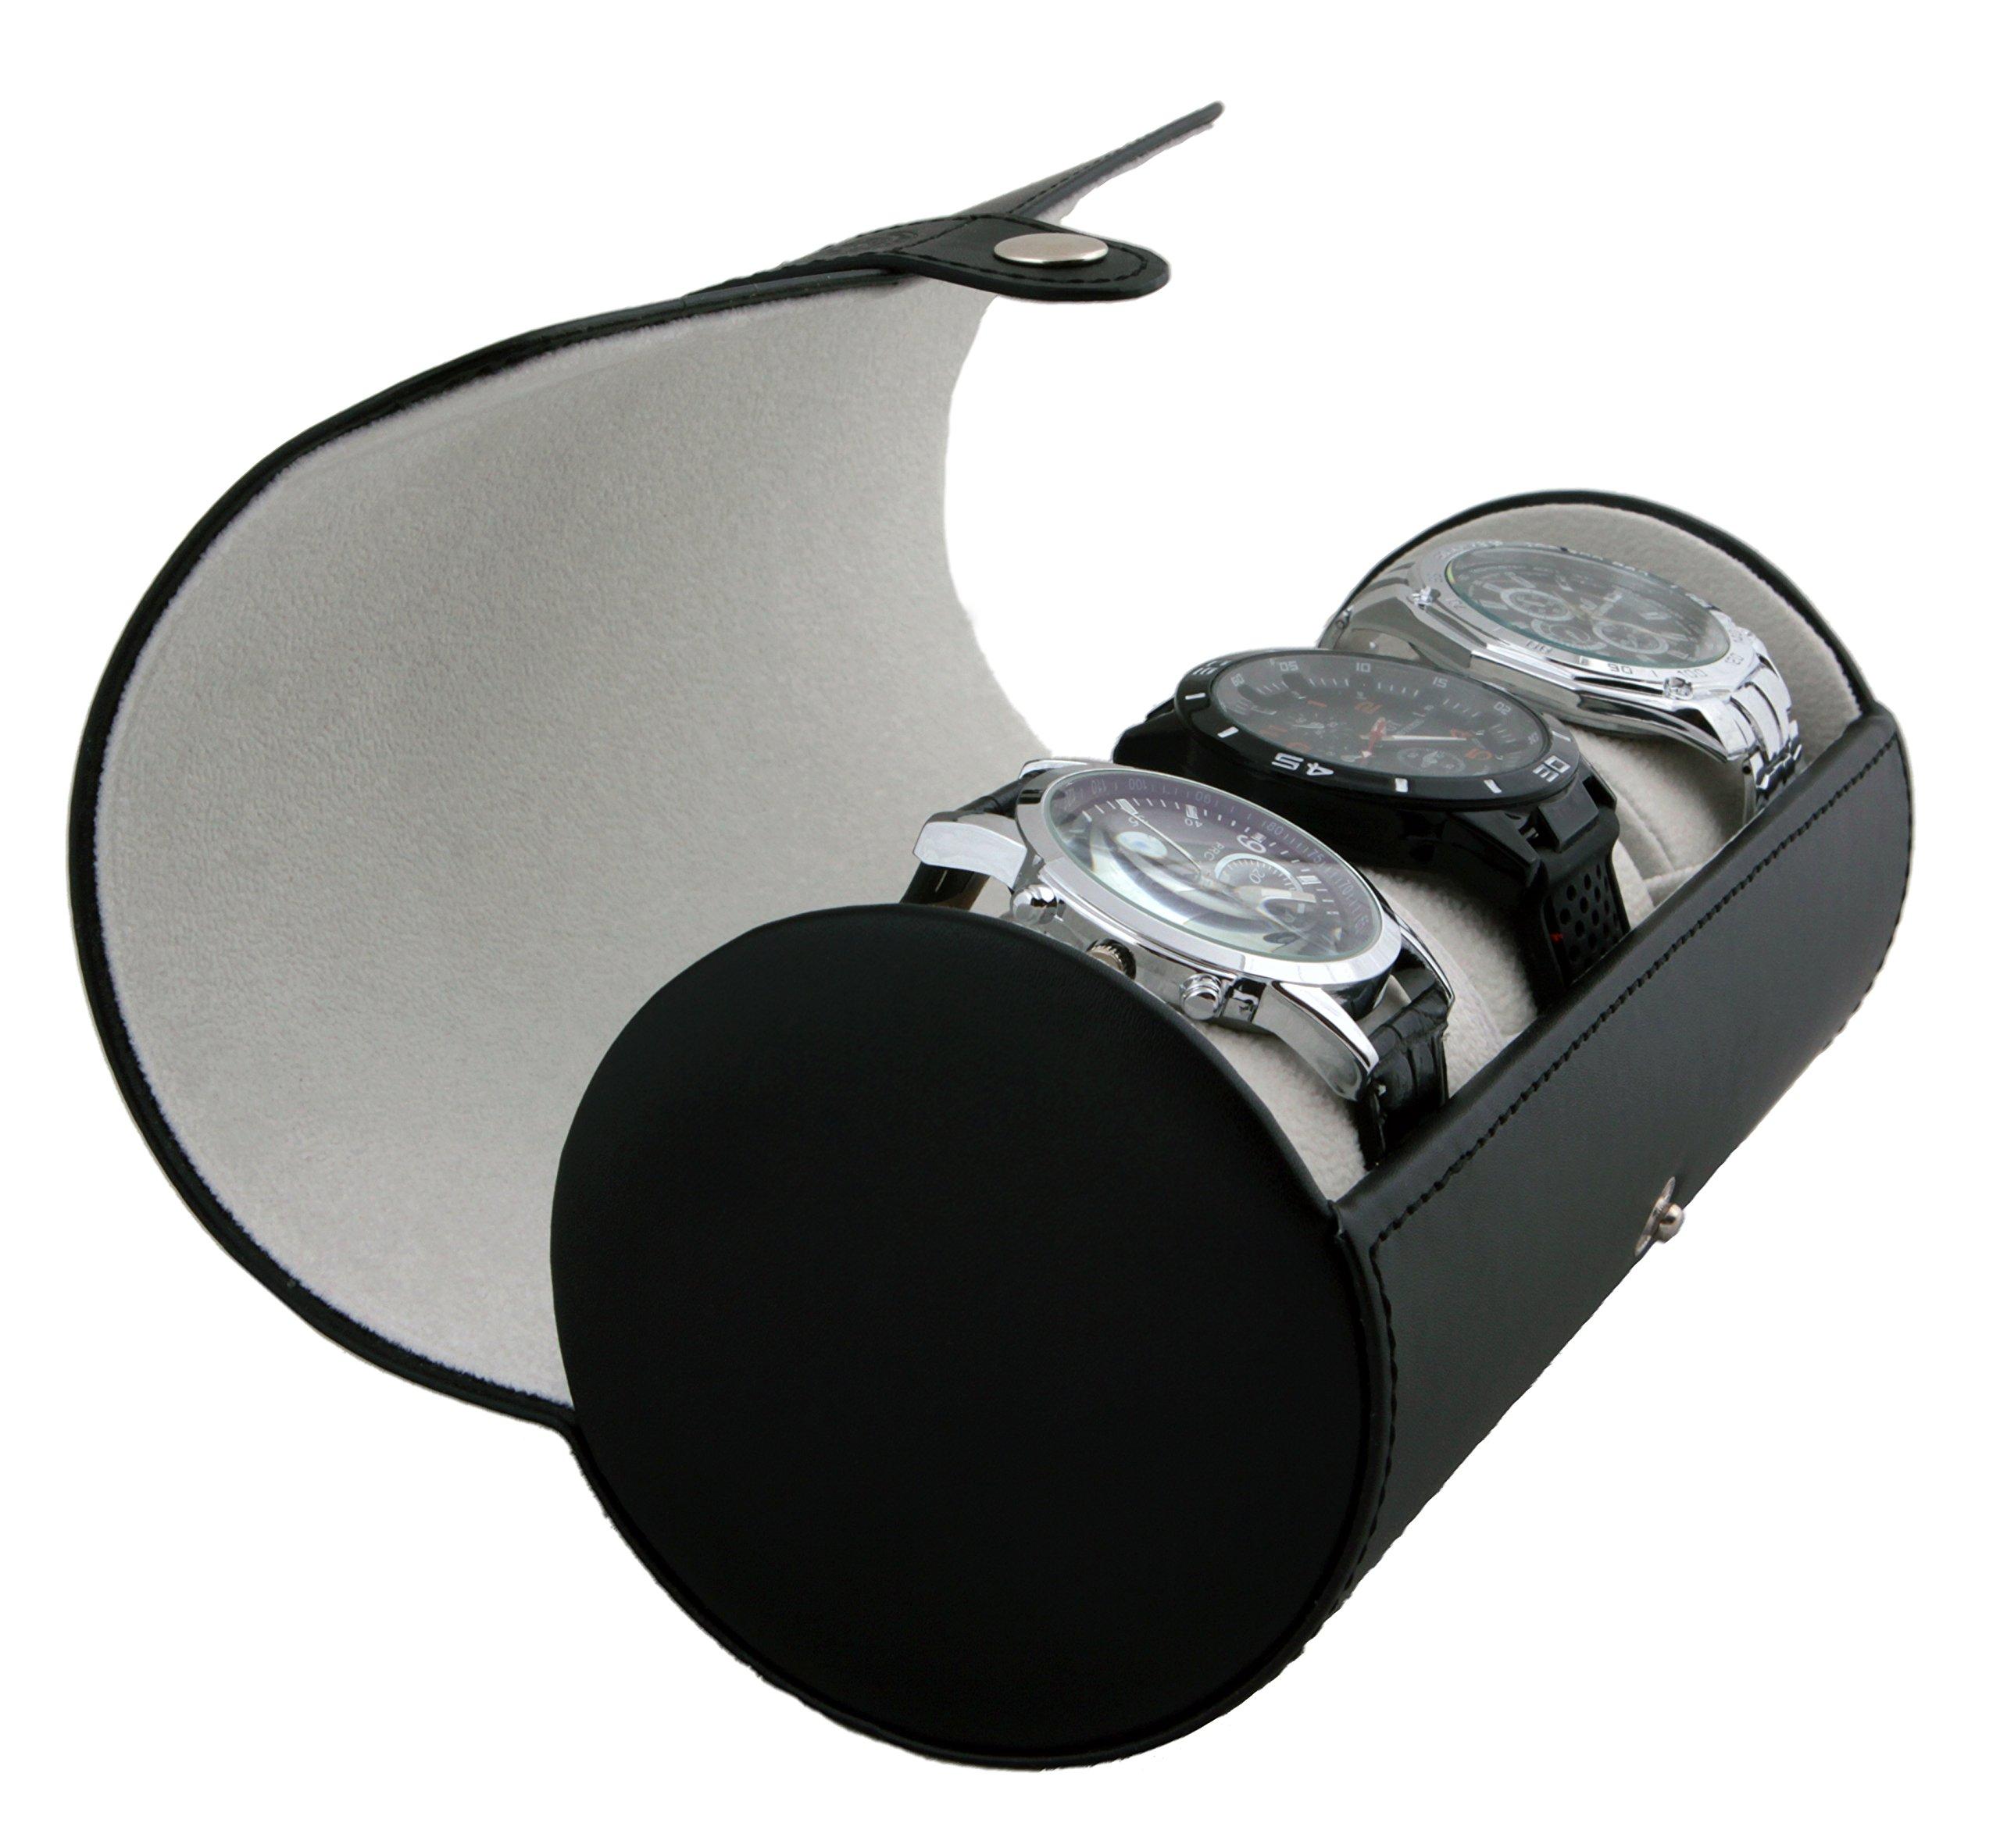 Vegan Leather Travel Watch Case Roll Organizer by Case Elegance - Classic Black